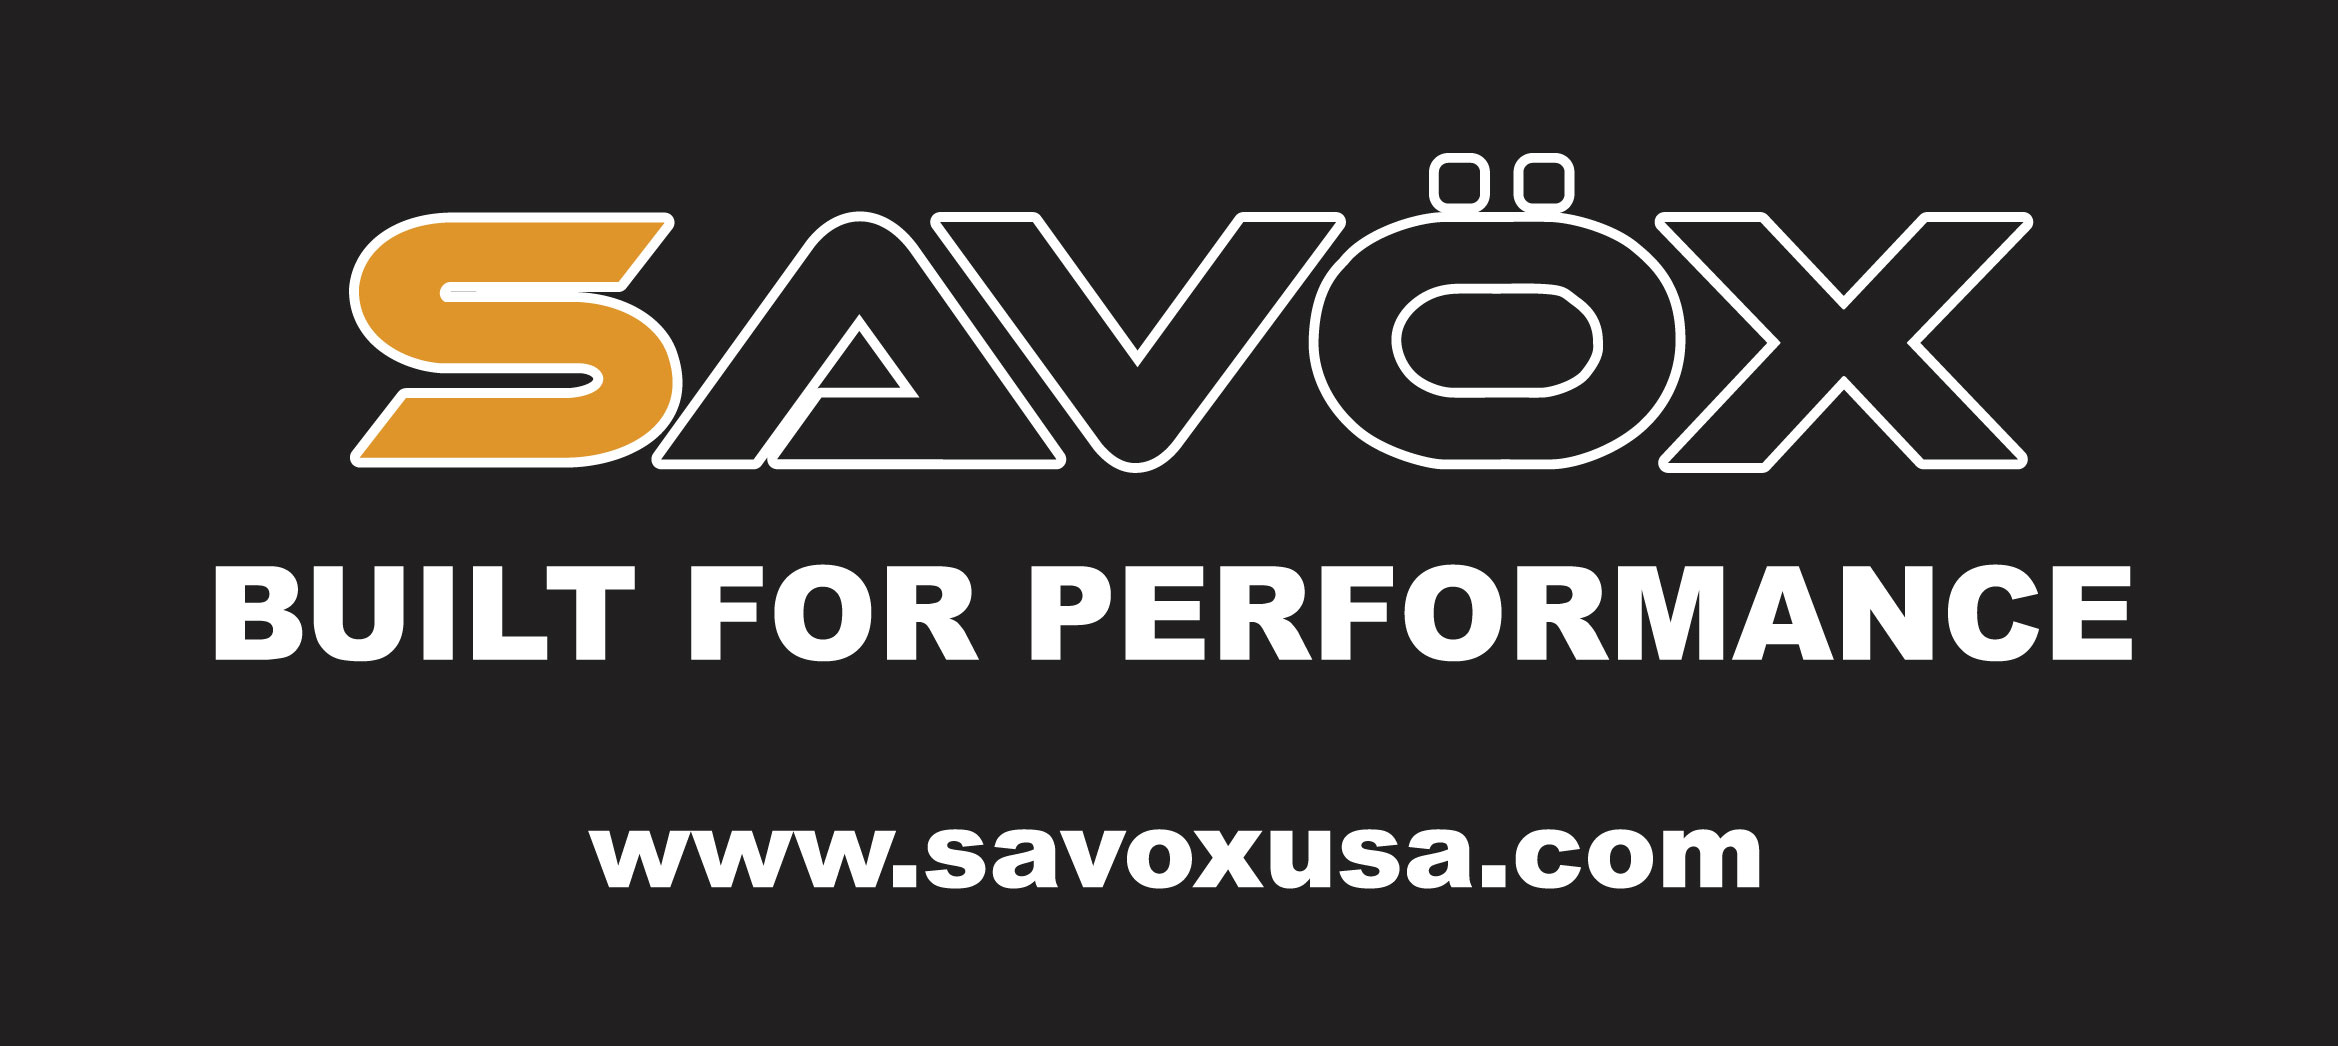 Savox Servo Banner 24